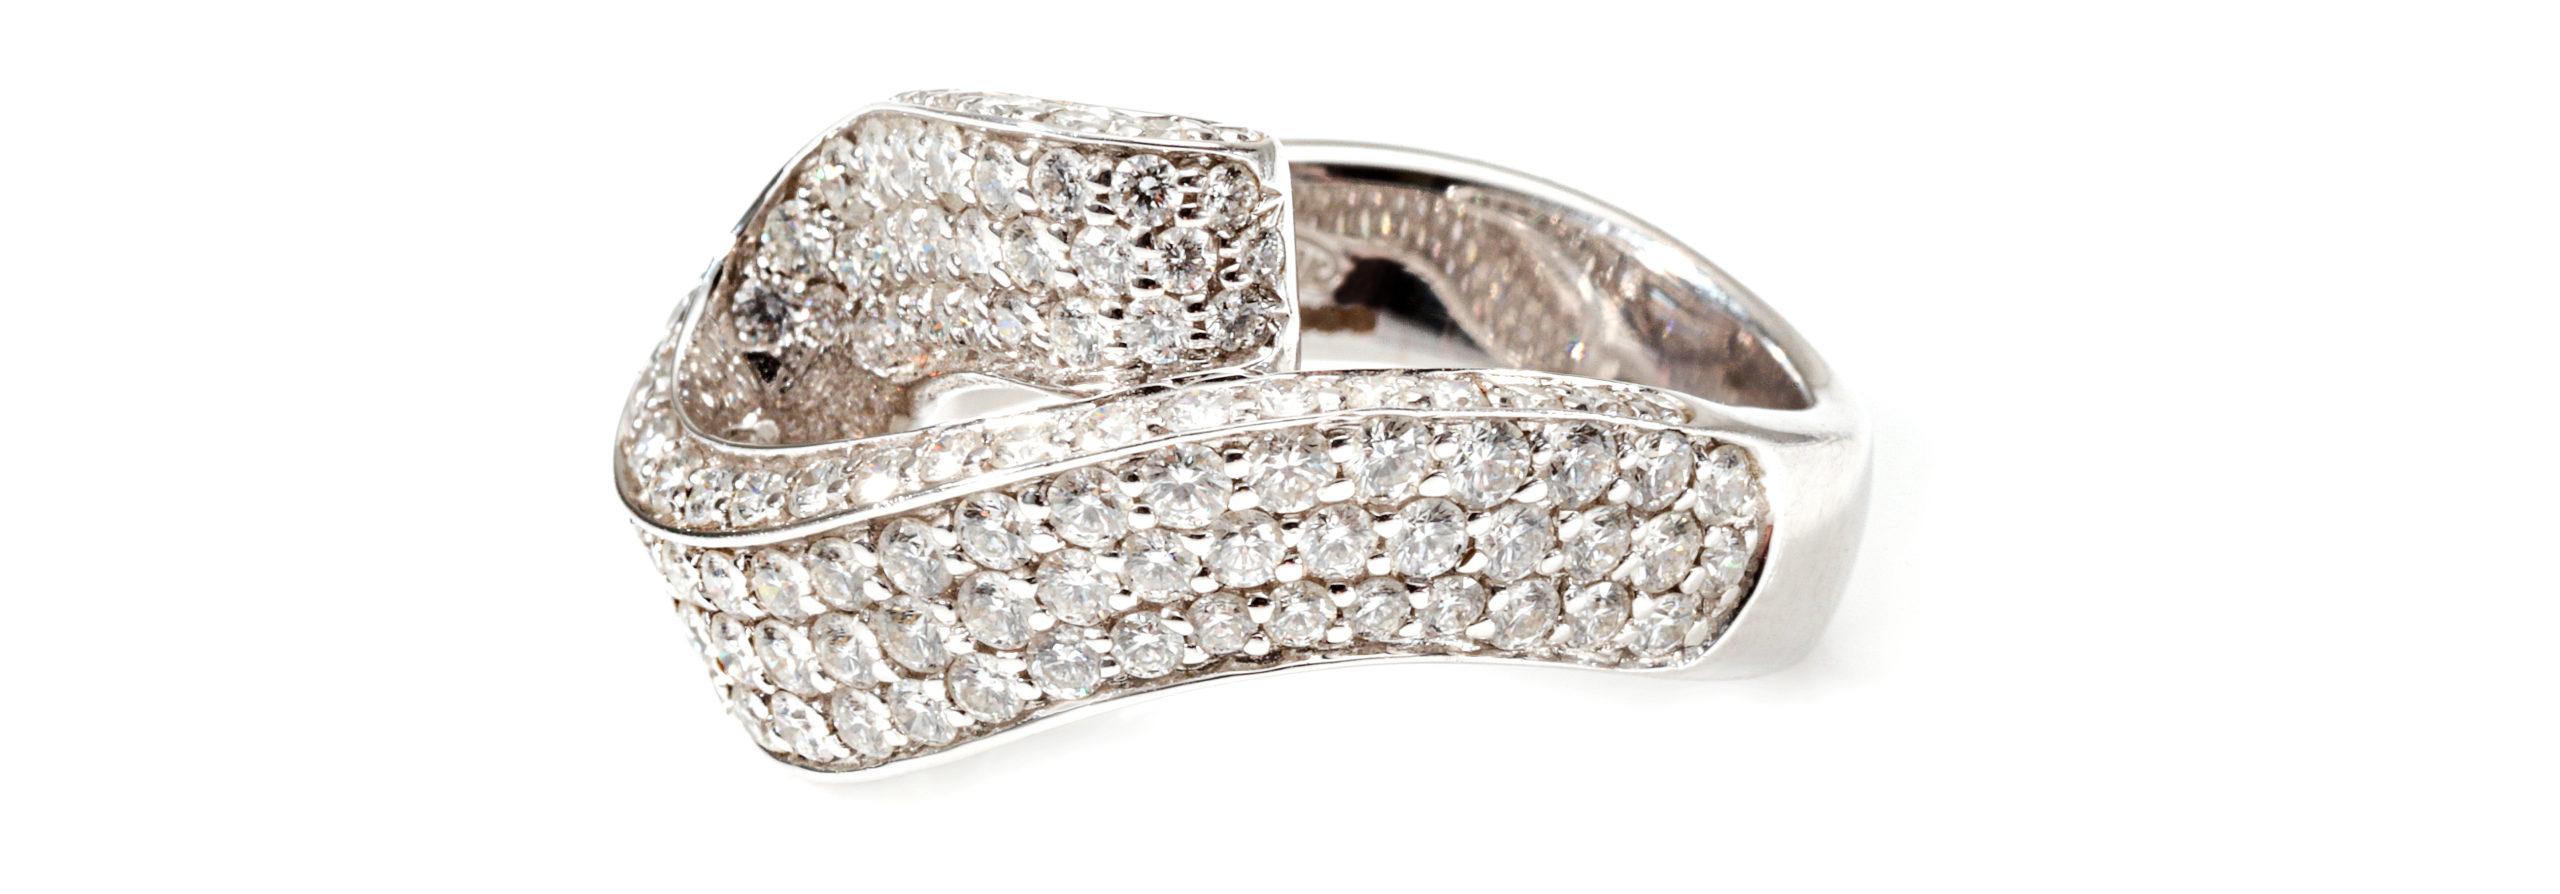 Louise Shafar Bespoke Jewellery